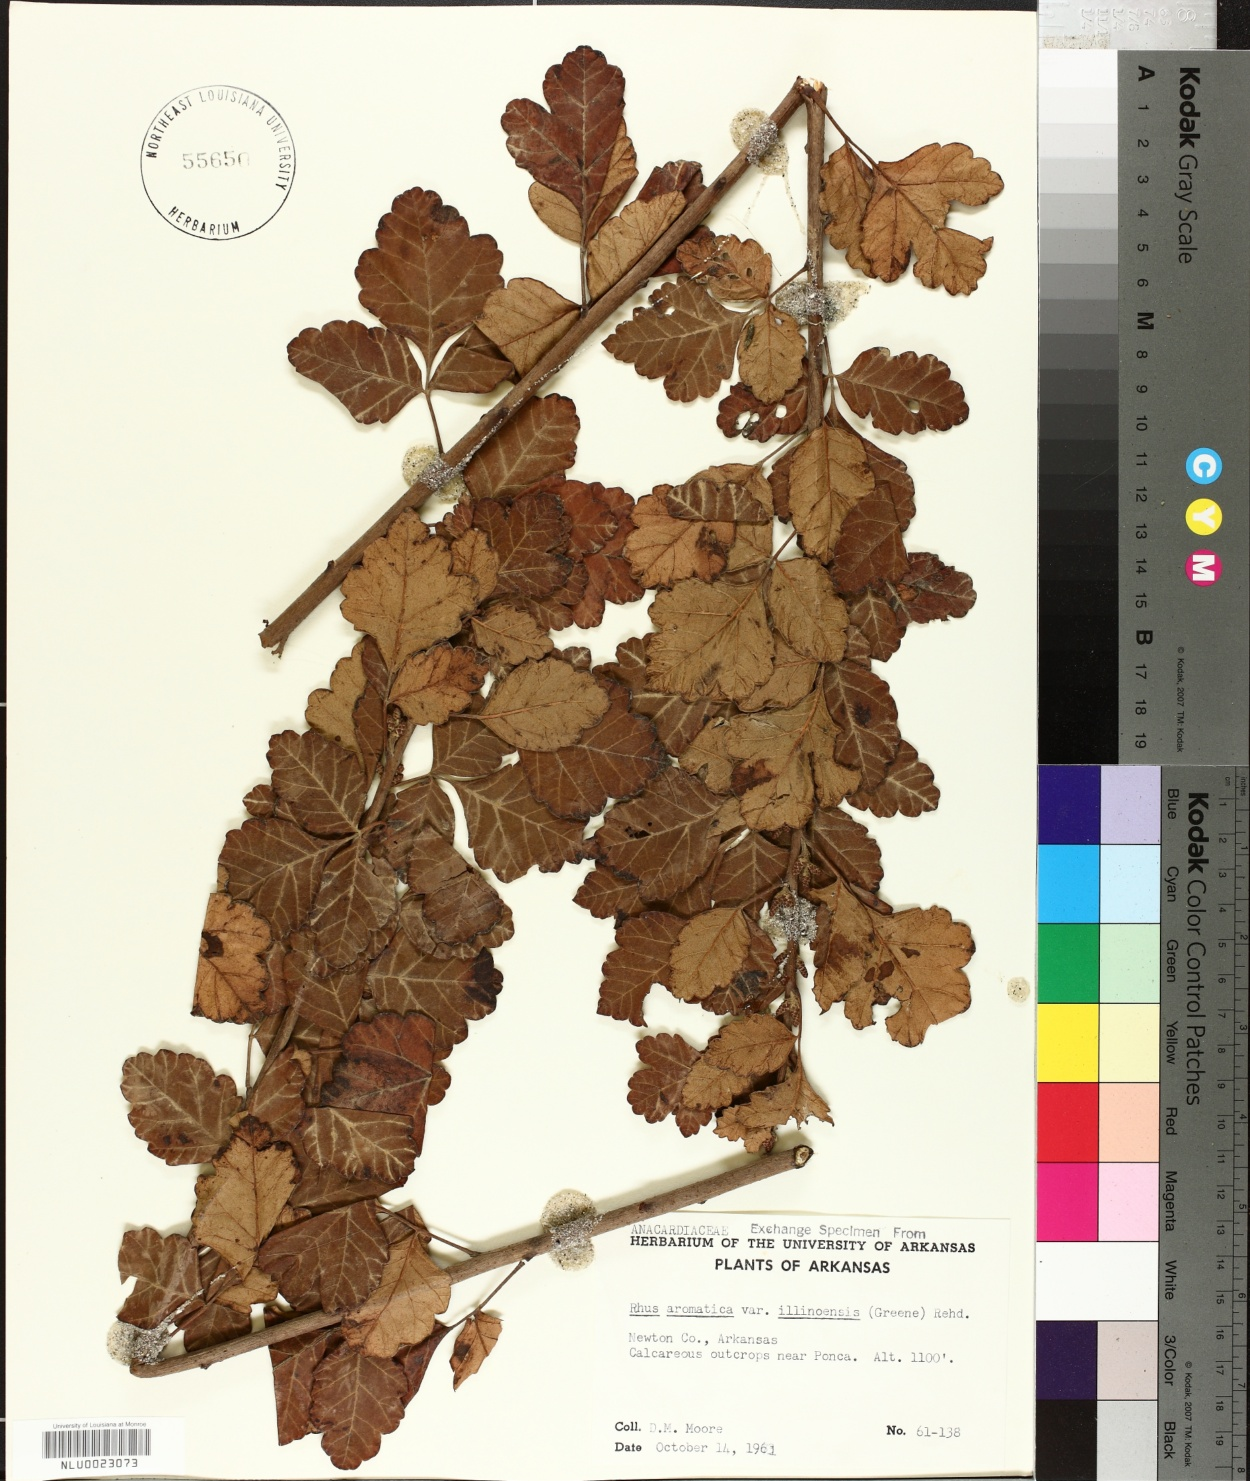 Rhus aromatica var. illinoensis image